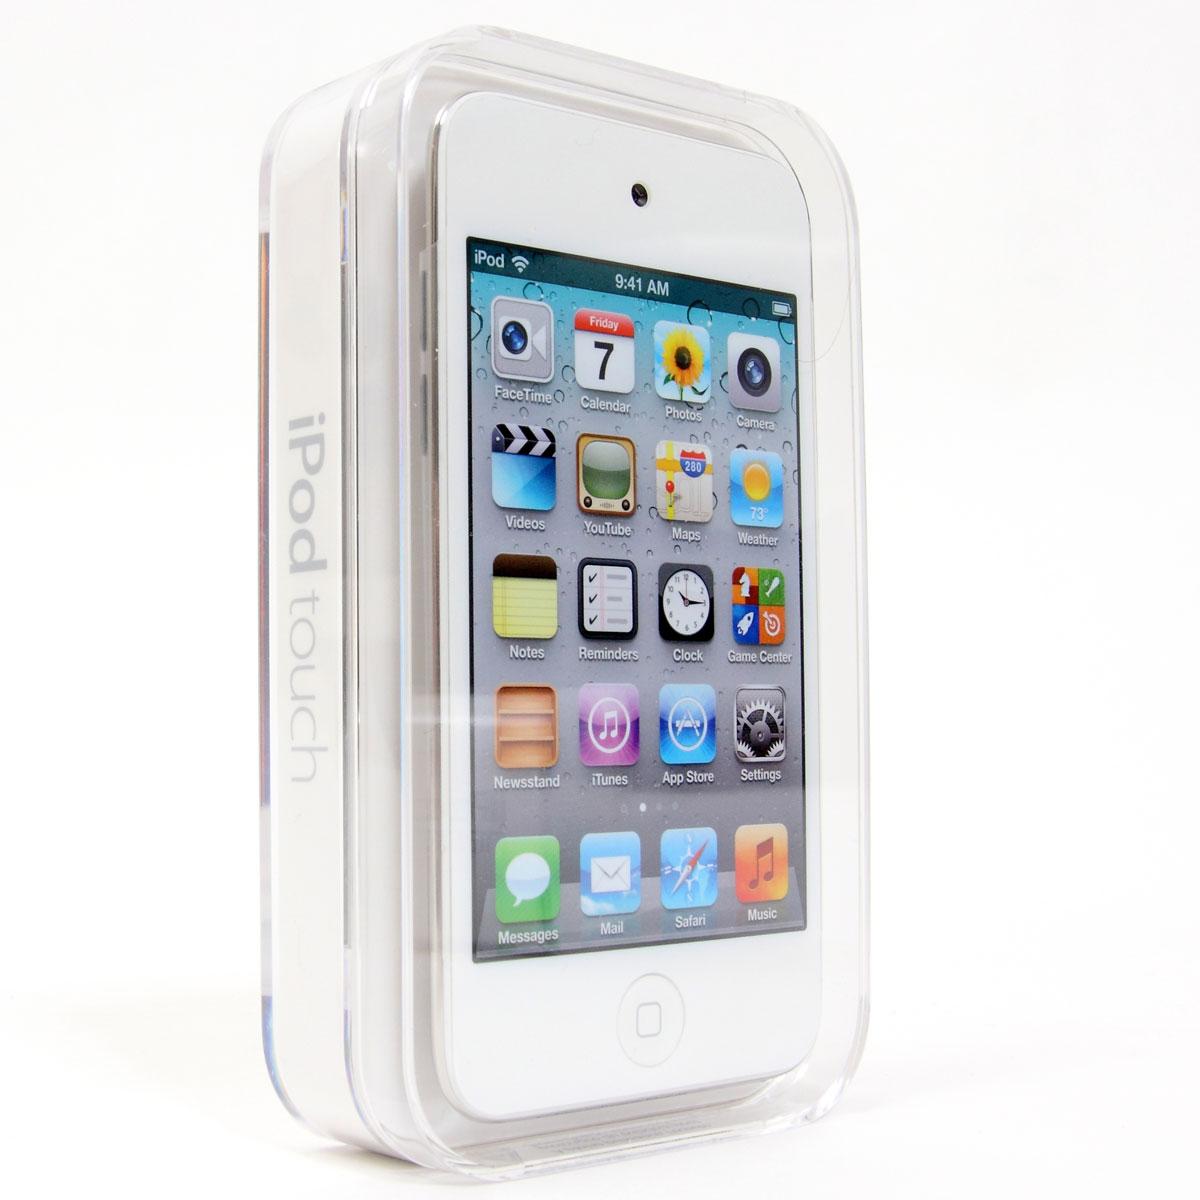 apple ipod touch blanc 16 go lecteur mp3 ipod apple. Black Bedroom Furniture Sets. Home Design Ideas